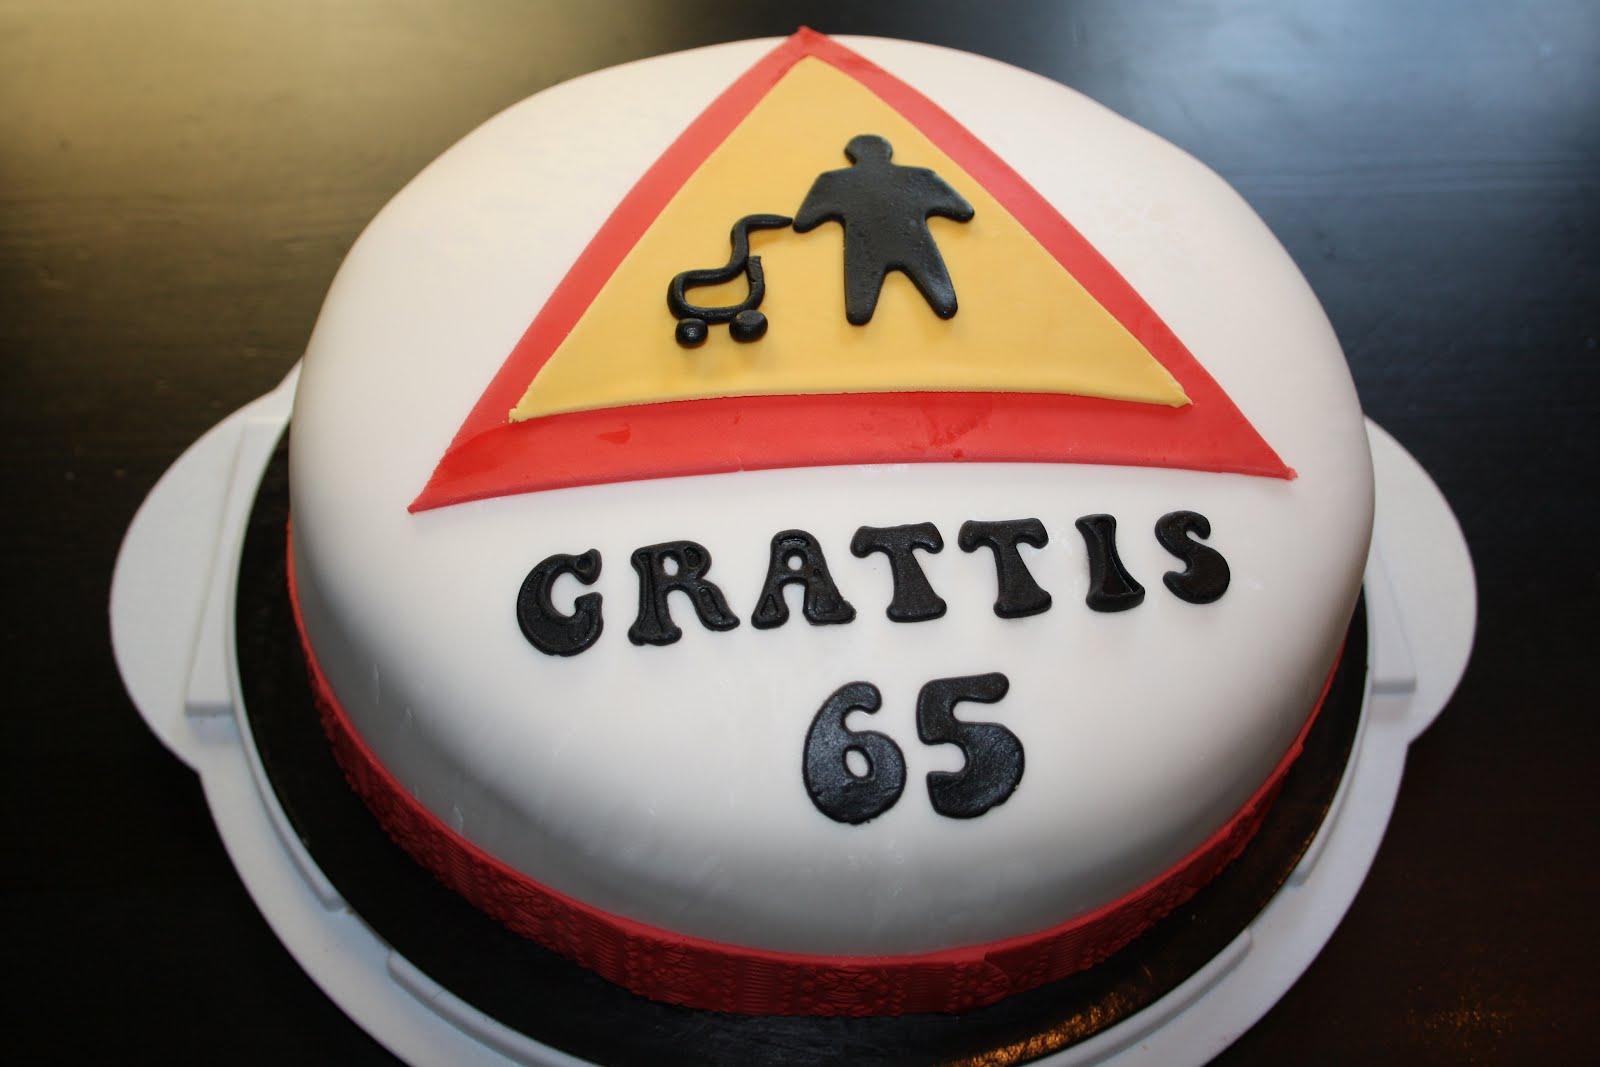 pensionär grattis Annicake: Grattis Pappa, pensionär :) pensionär grattis